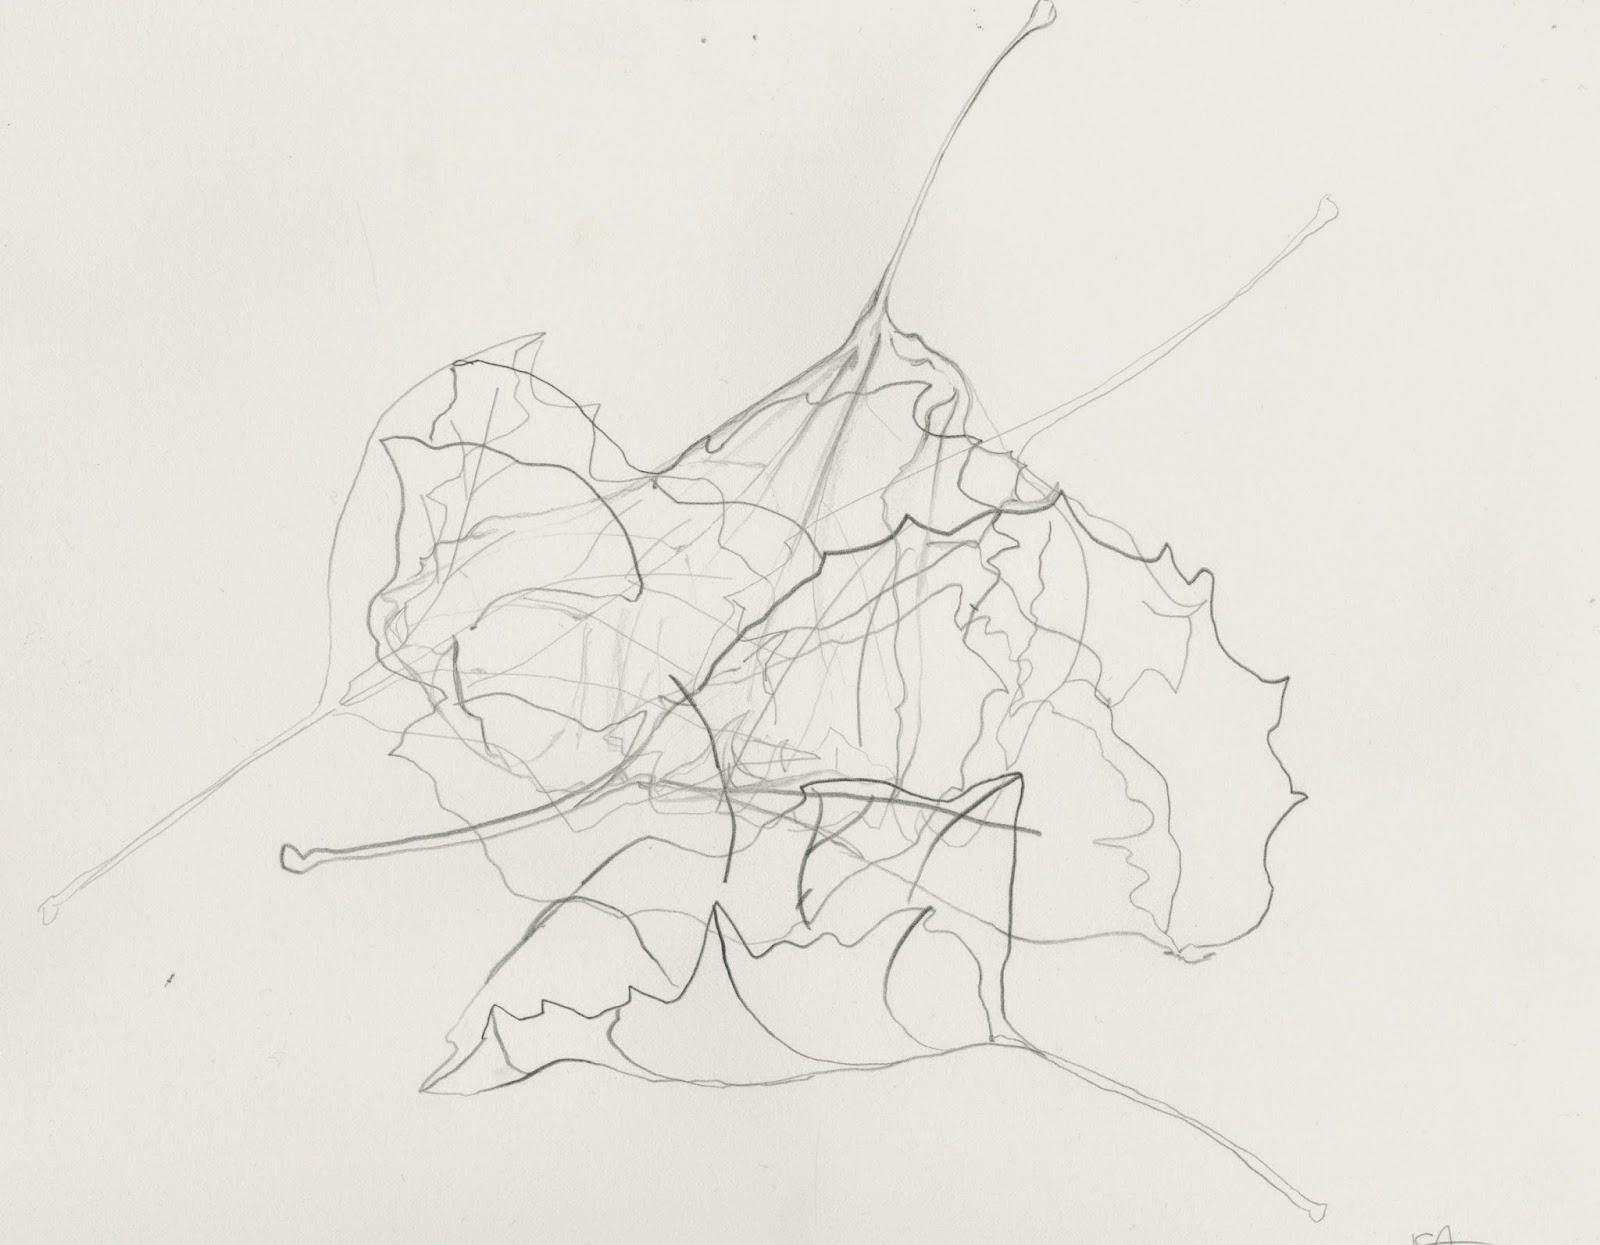 Contour Line Drawing Leaf : Introduction to the studio isabella gonzalez leaf